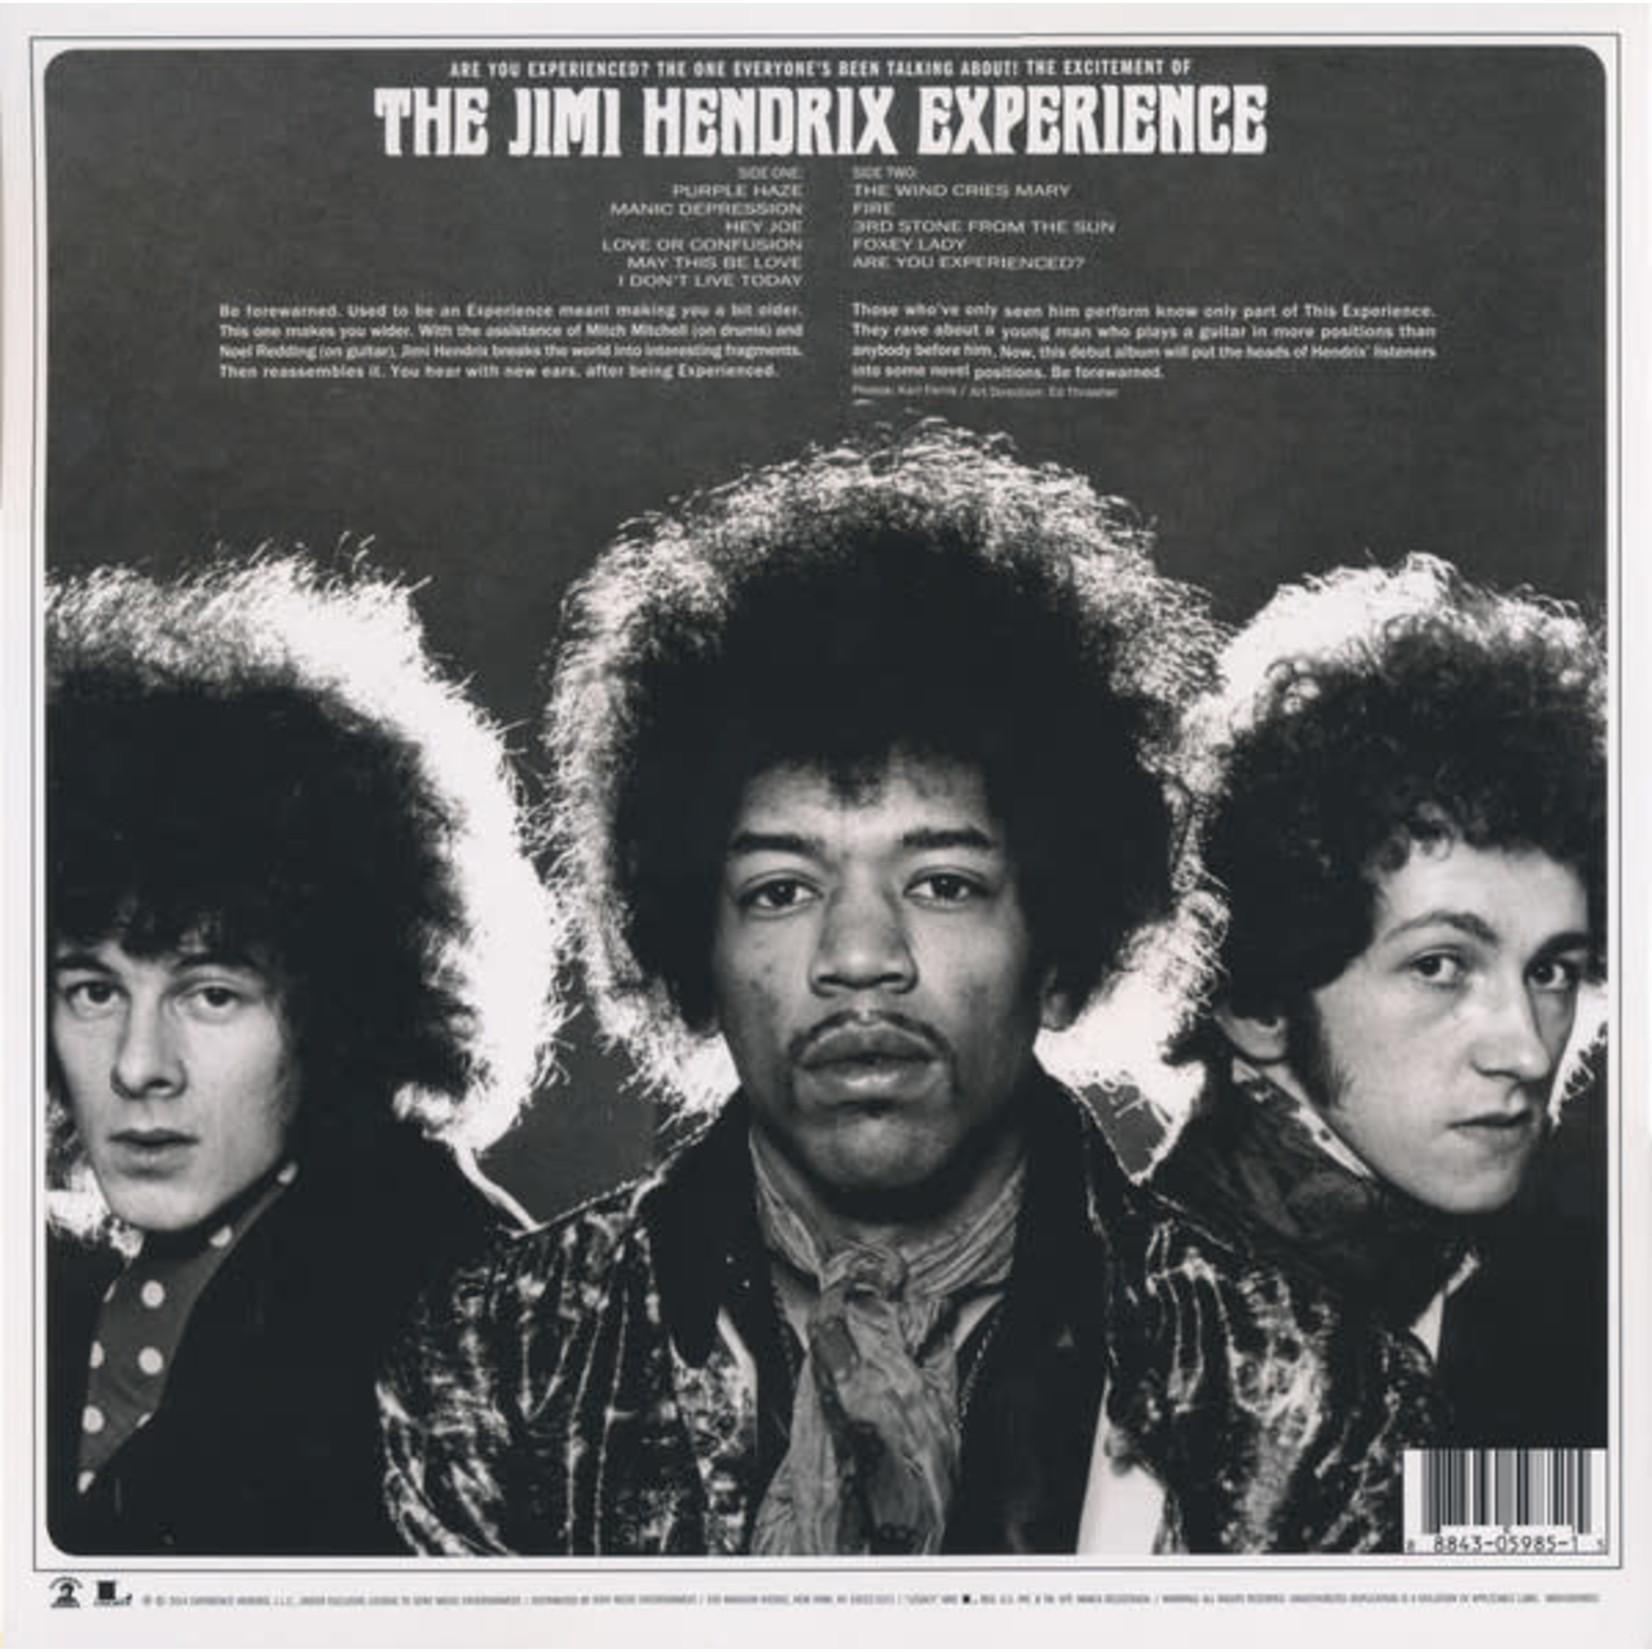 JIMI HENDRIX ARE YOU EXPERIENCED